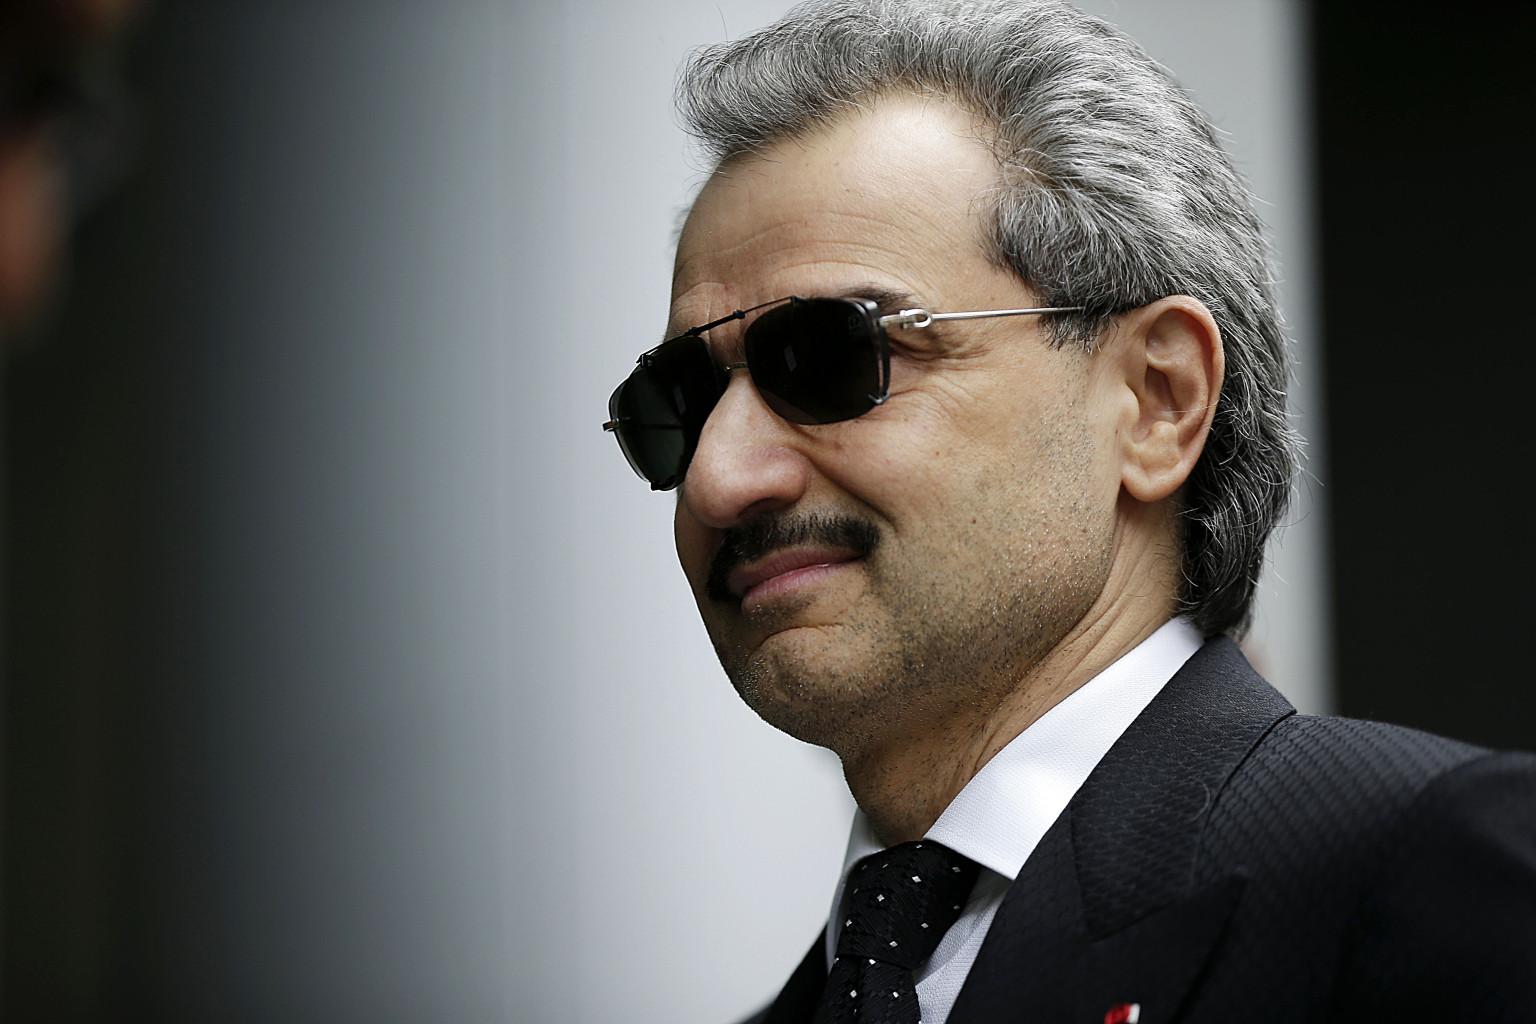 Billionaire Saudi Prince Alwaleed Bin Talal Trolls Trump: 'I Bailed You Out Twice'